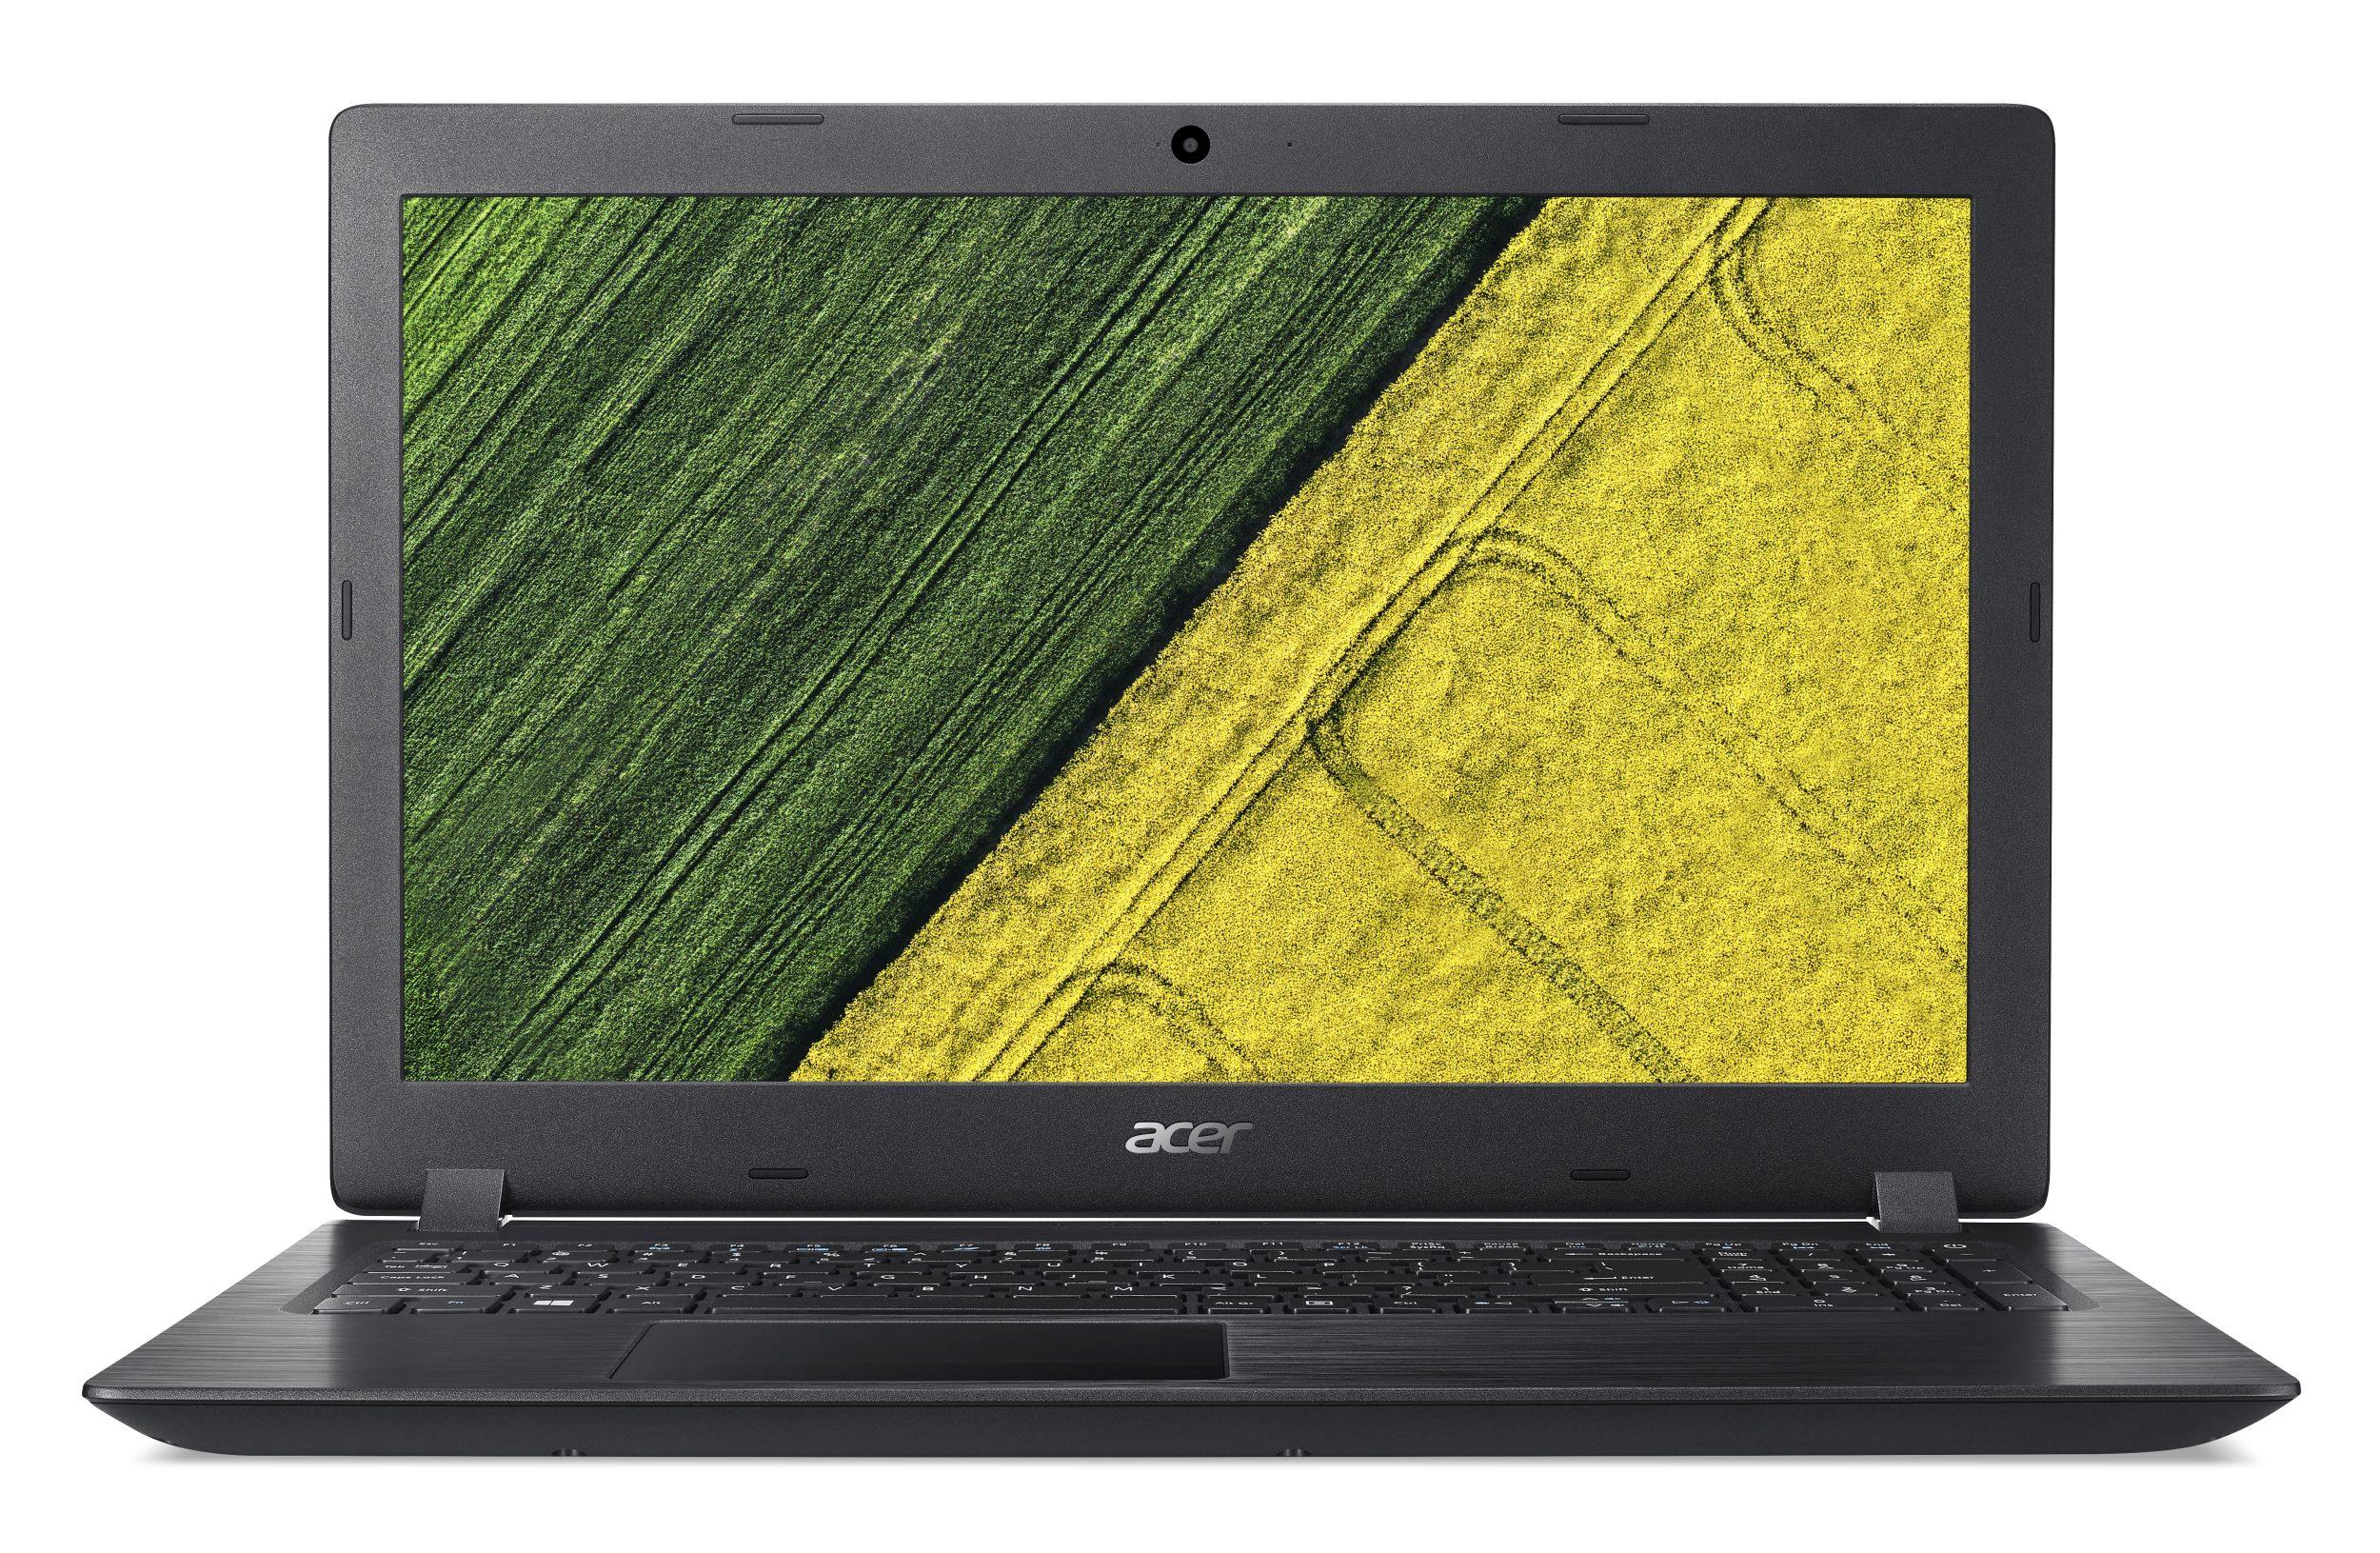 "Acer Aspire 3 (A315-51-55E3) Core i5-7200U/4GB+N/256GB+N/15.6""FHD LED LCD/HD Graphics/W10 Home/Black"